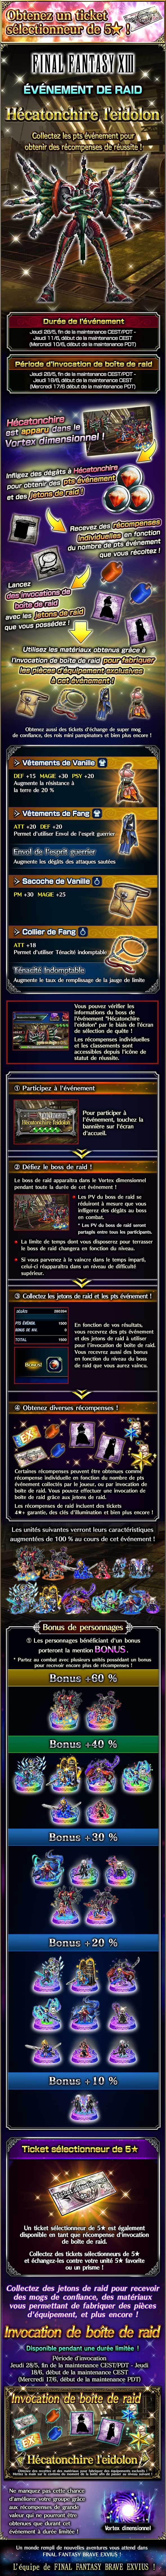 Evenement Raid - FFXIII - Hécatonchire l'eidolon - du 28/05 au 11/06/20 20200526FFXIIIRaidGuidingHands